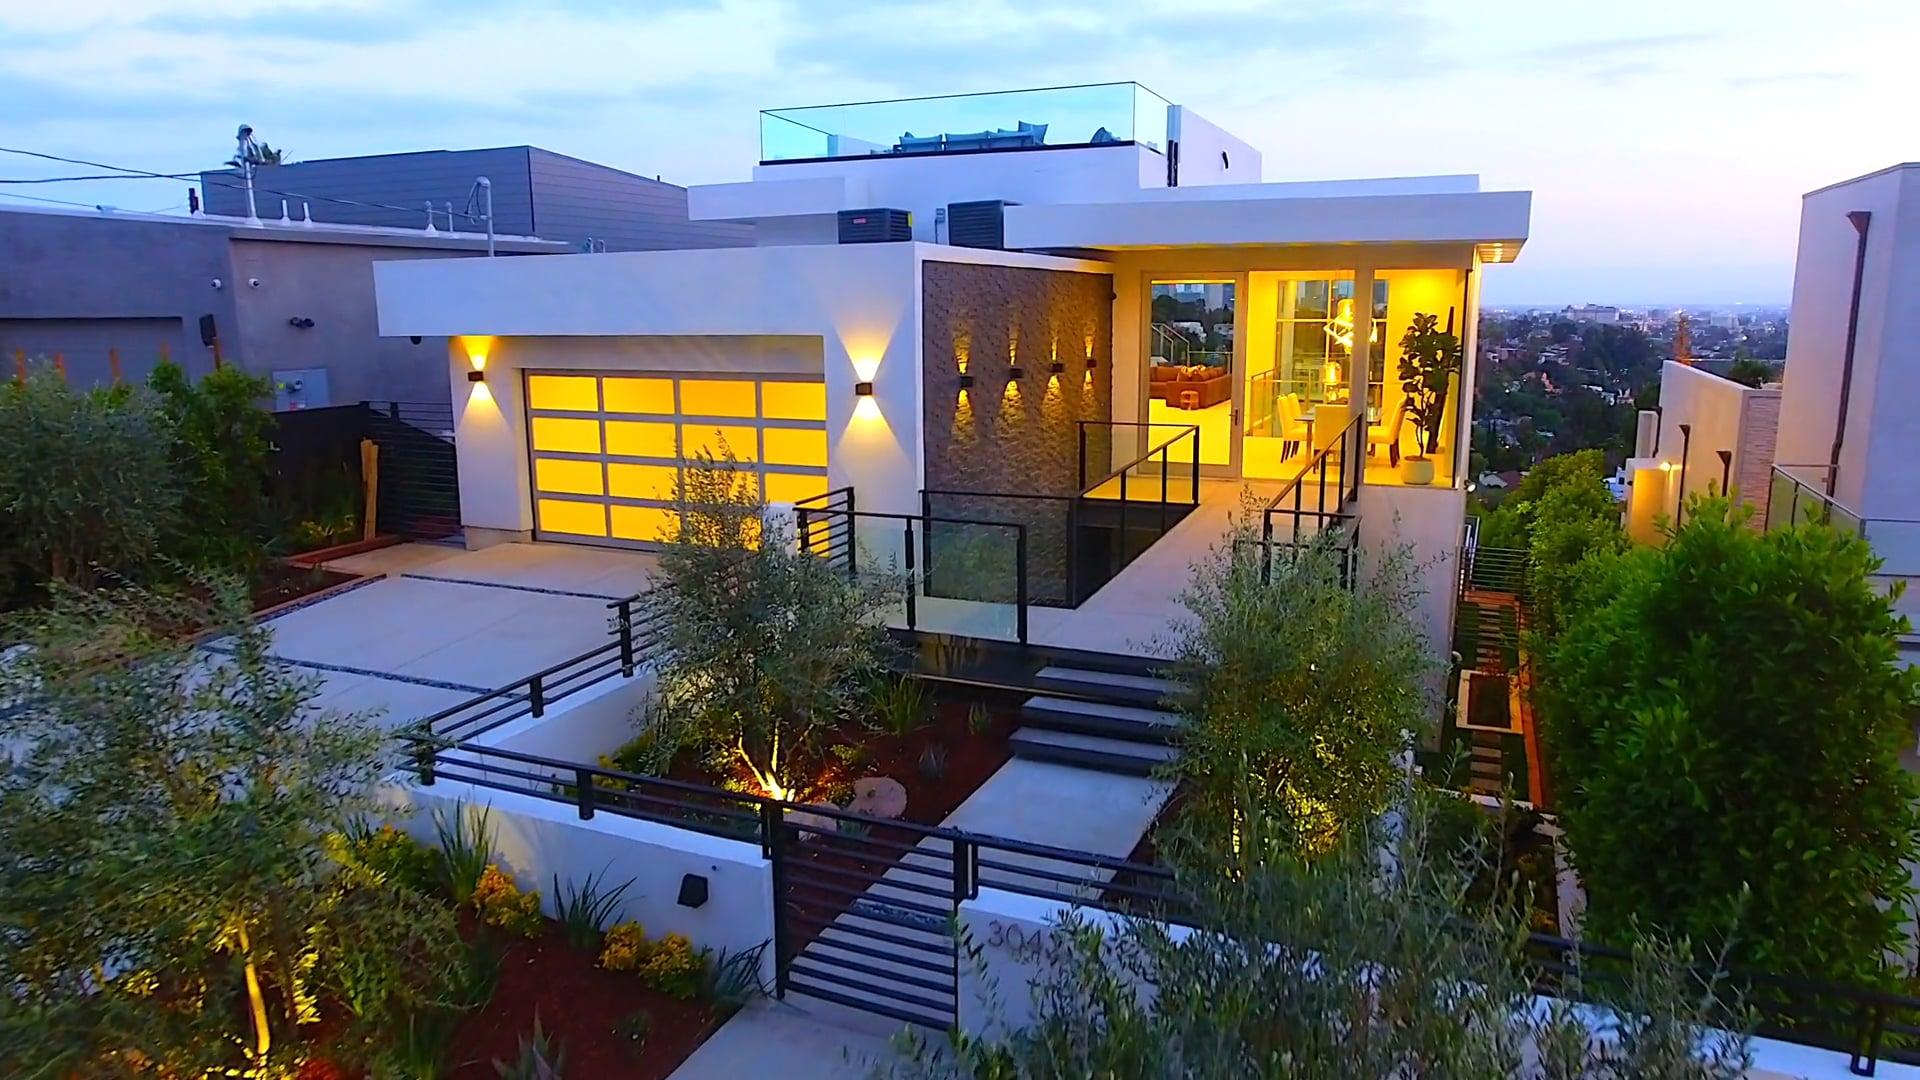 3042 Landa St, Los Angeles, CA 90039